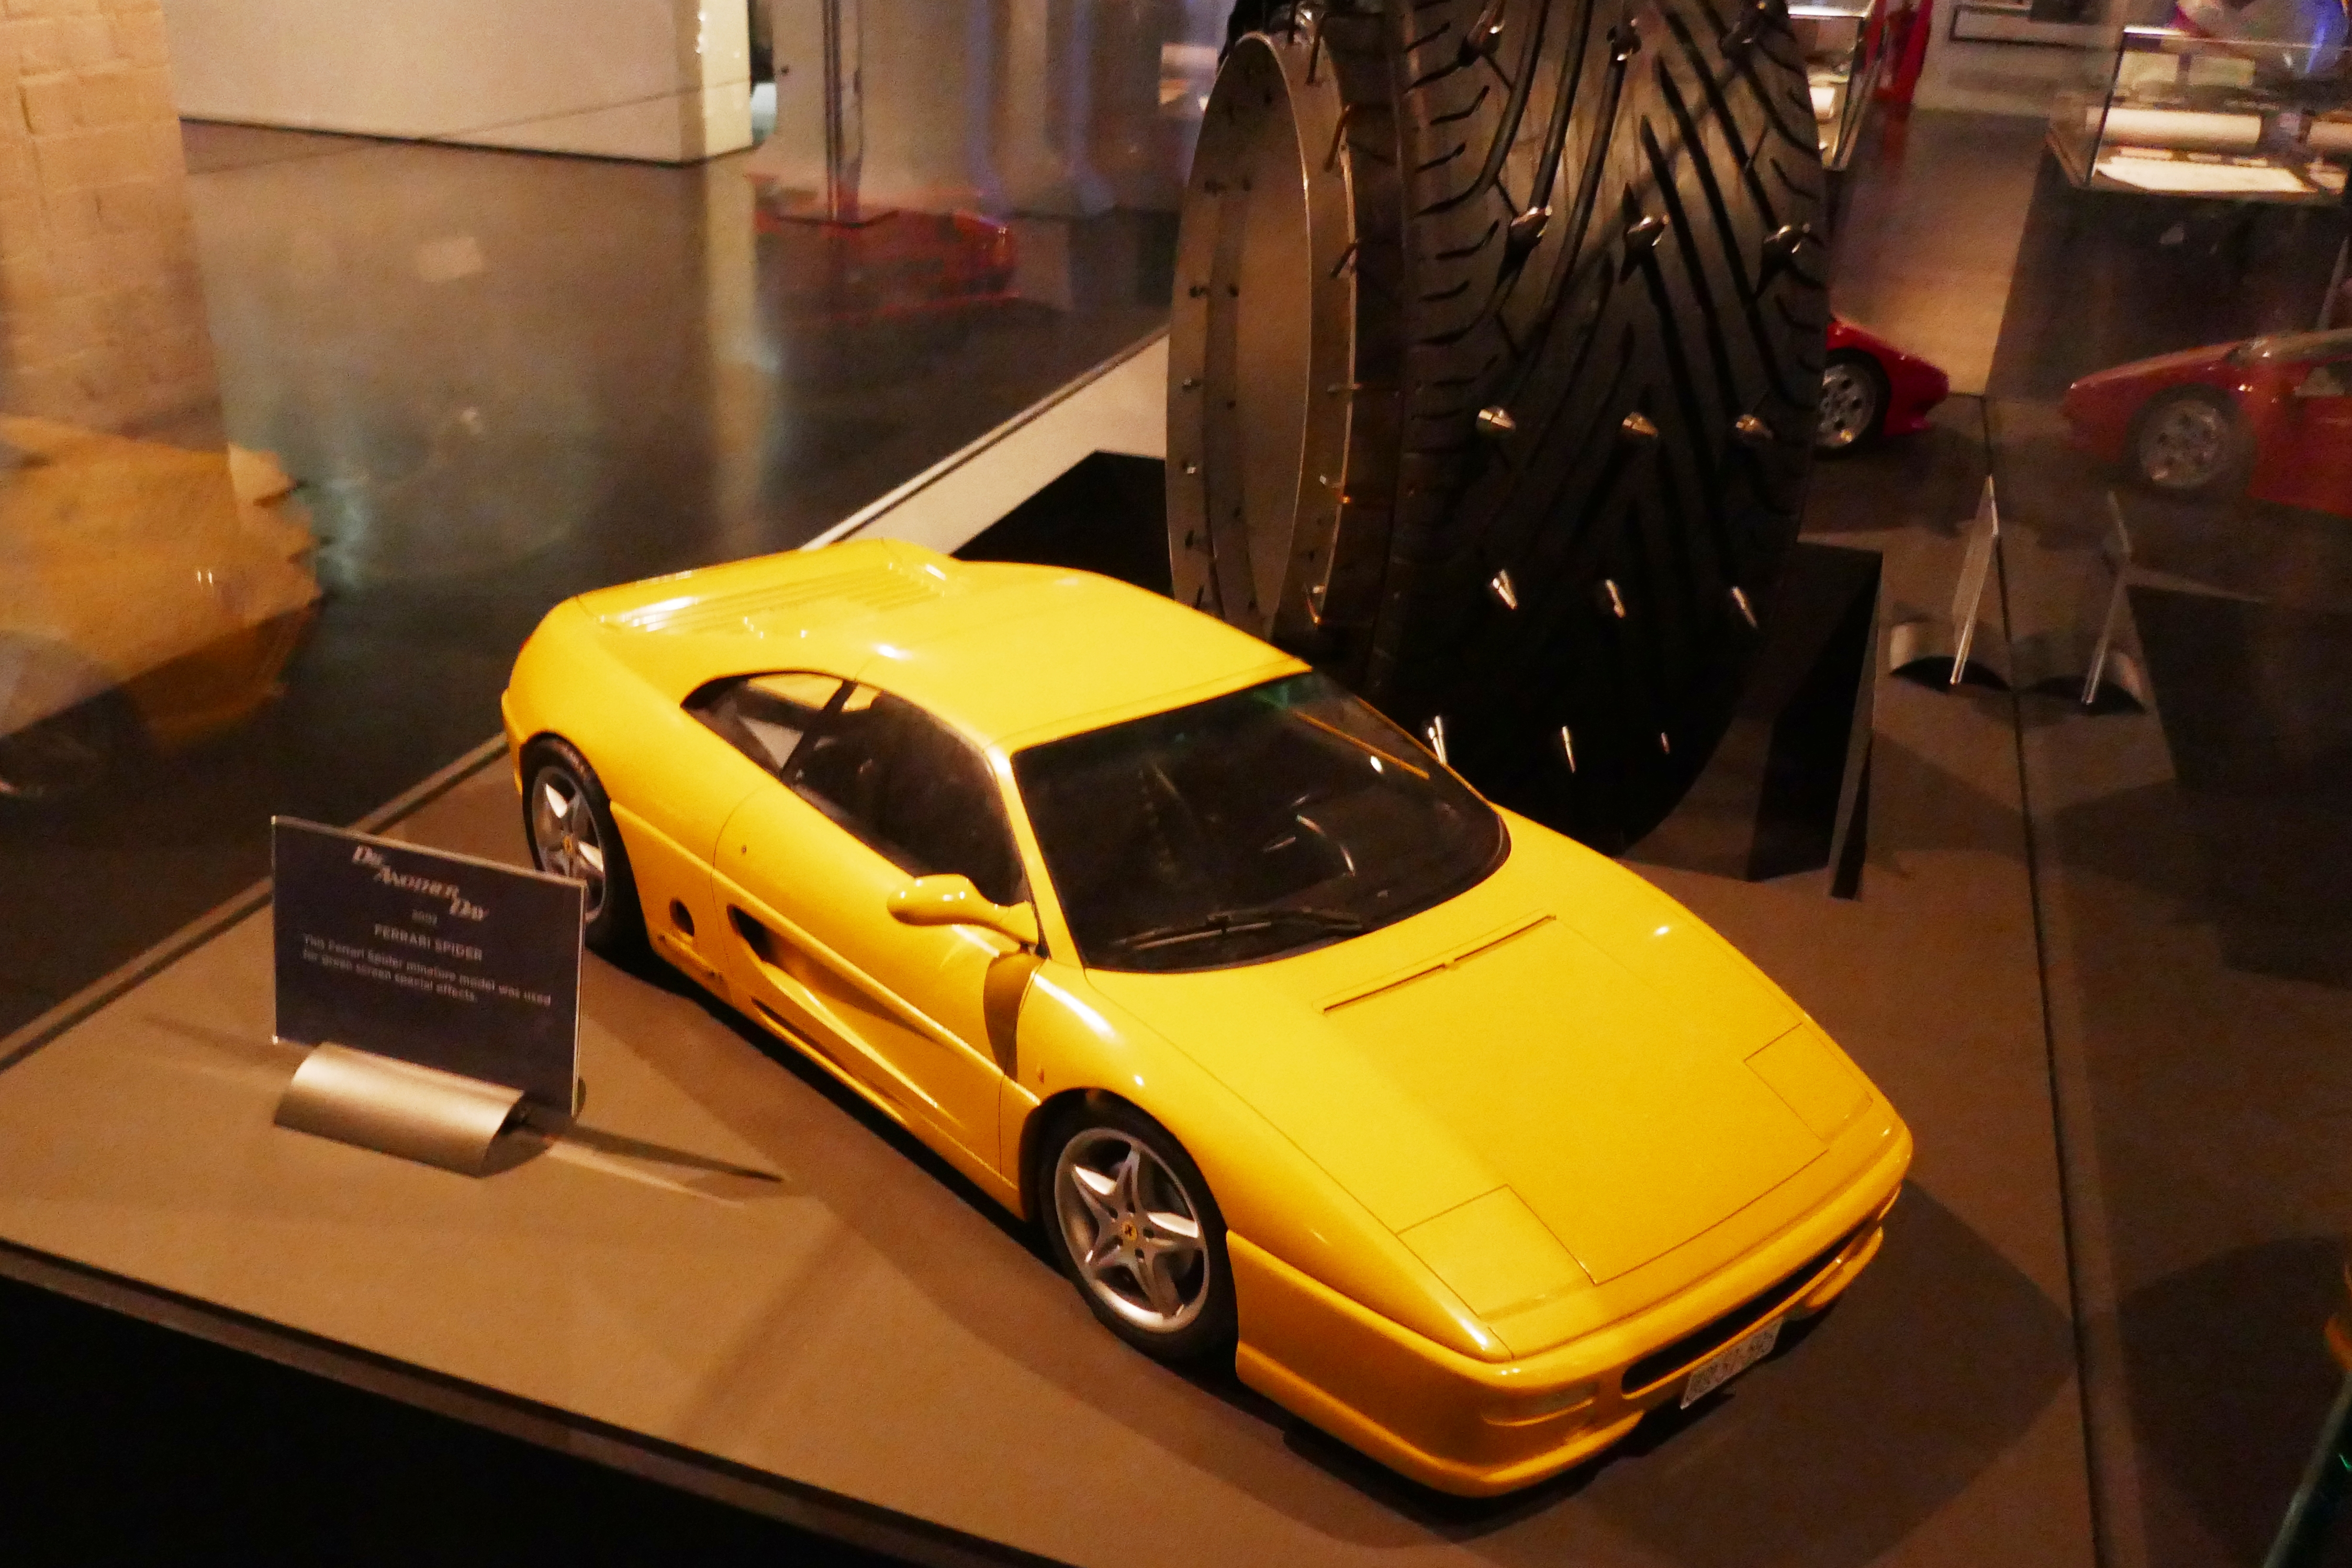 Filedie Another Day Ferrari Spider Miniaturejpg Wikimedia Commons